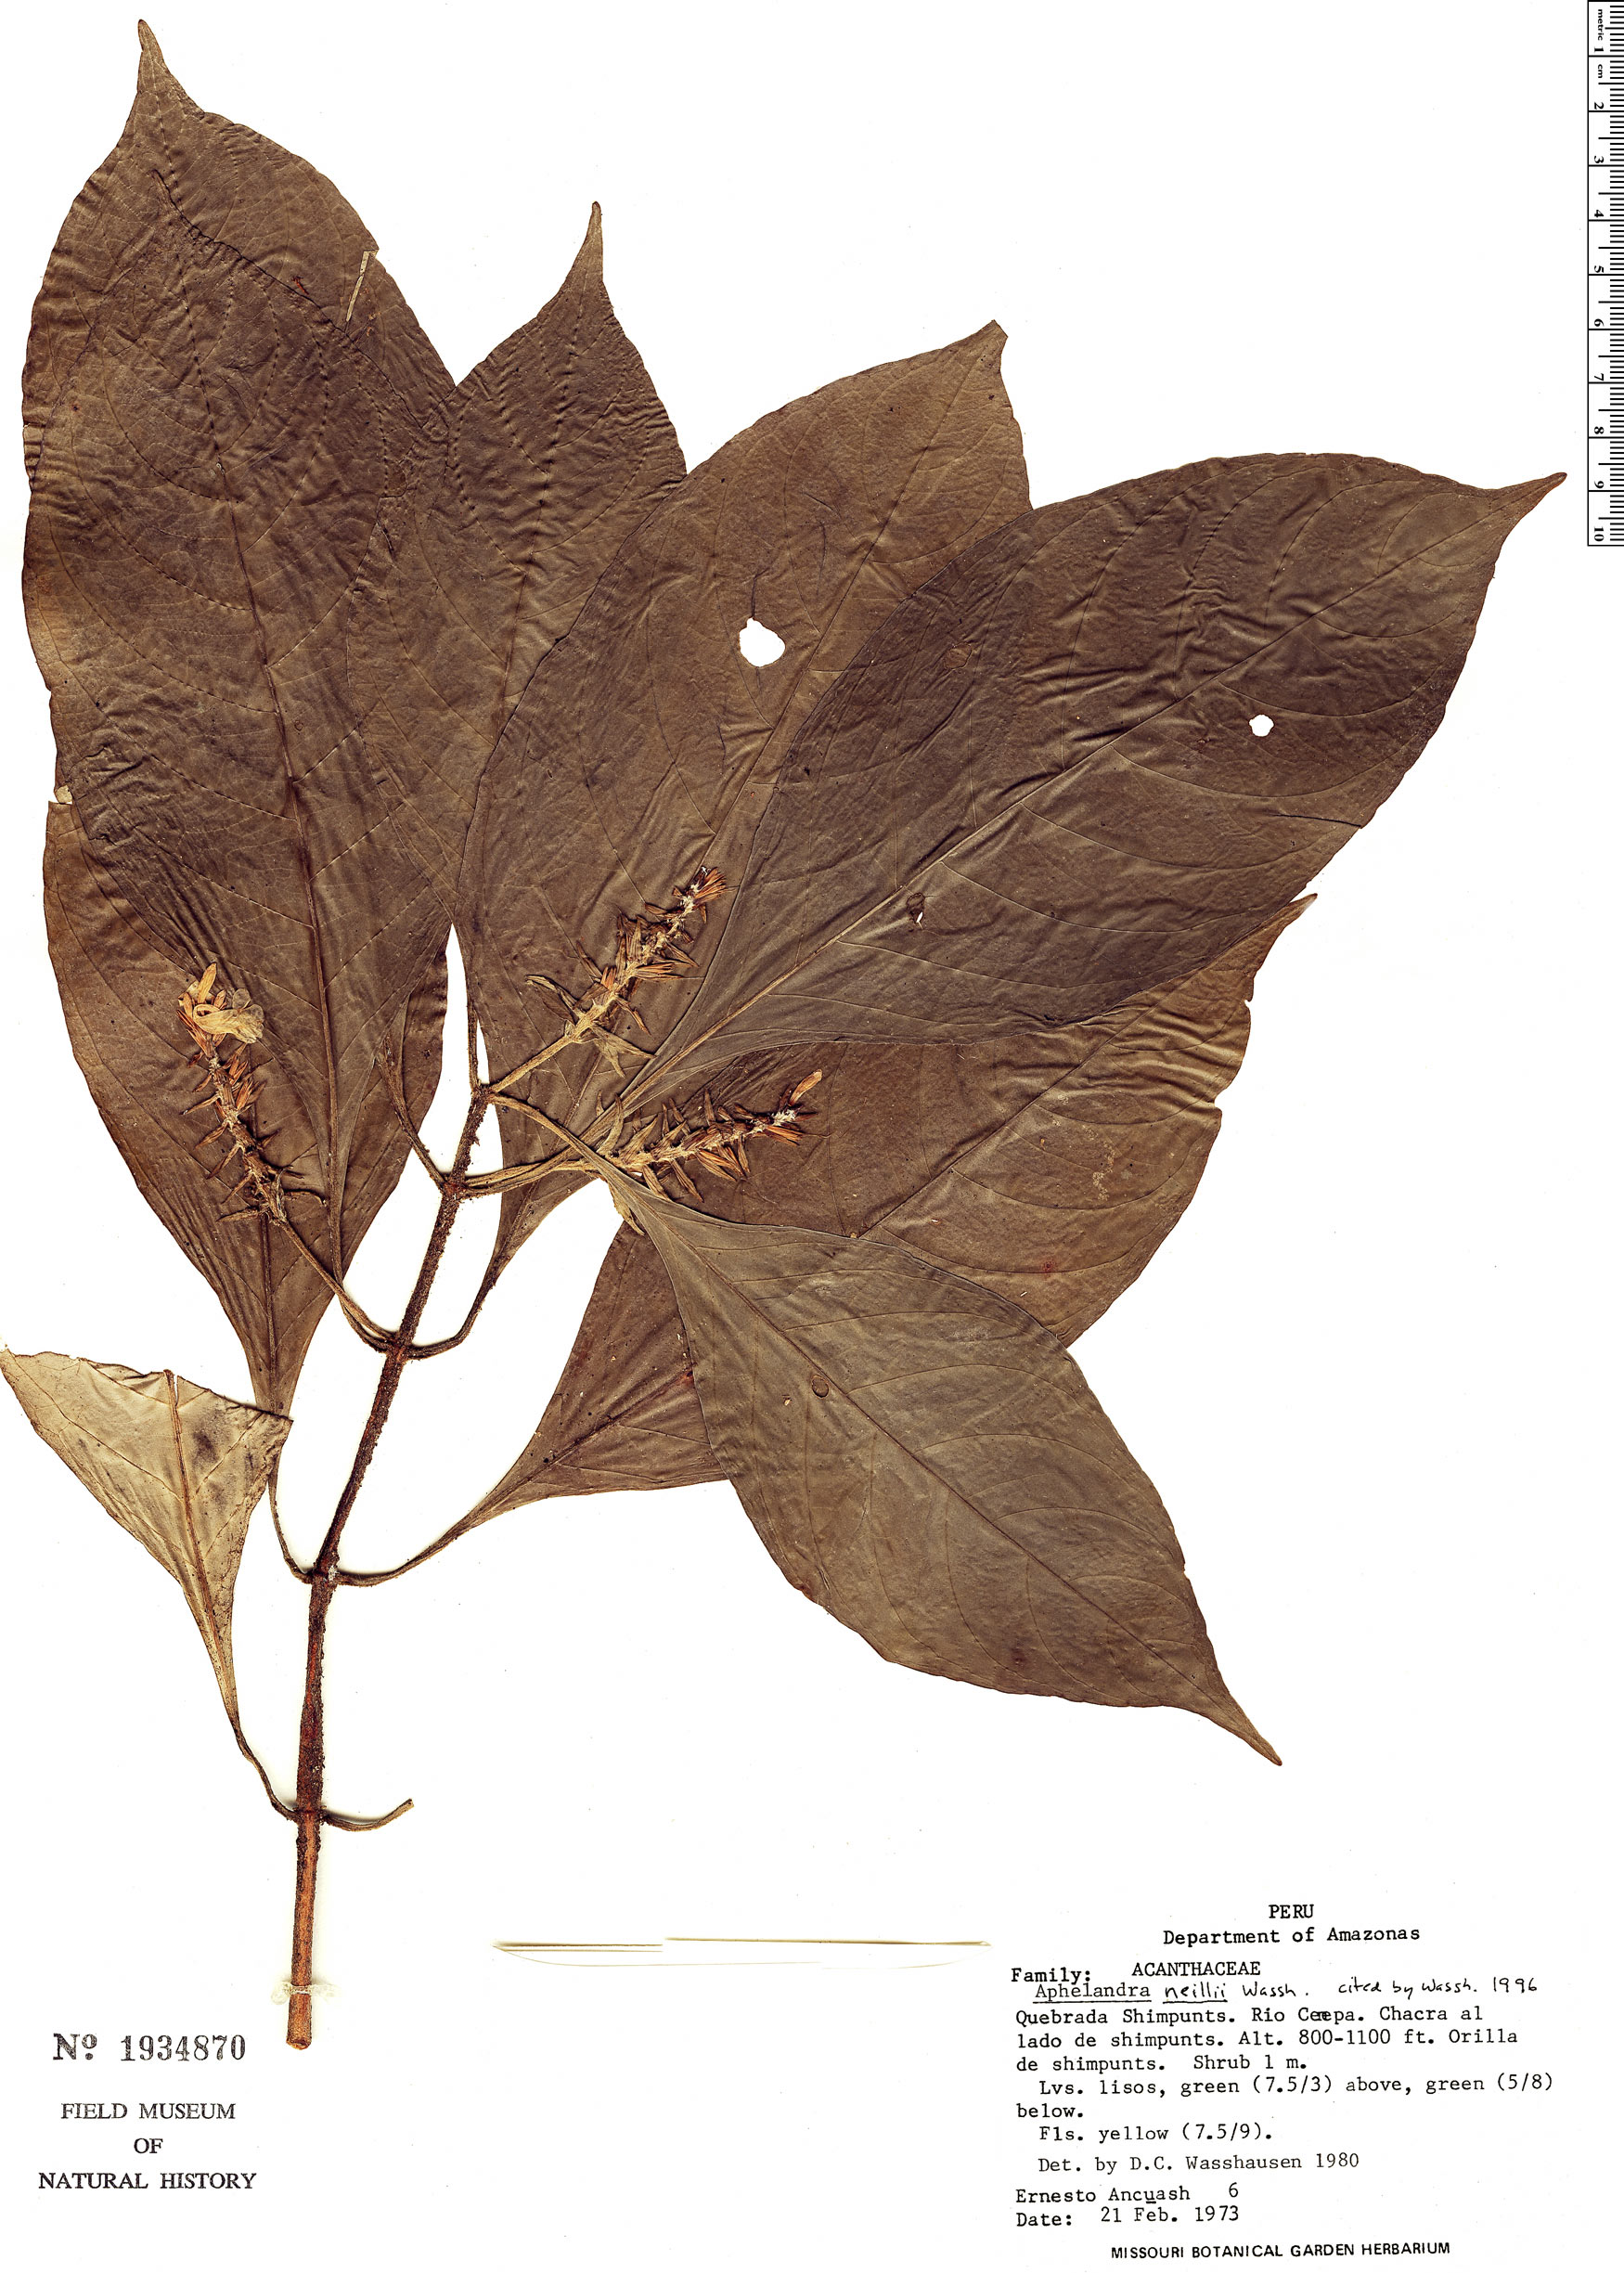 Specimen: Aphelandra neillii